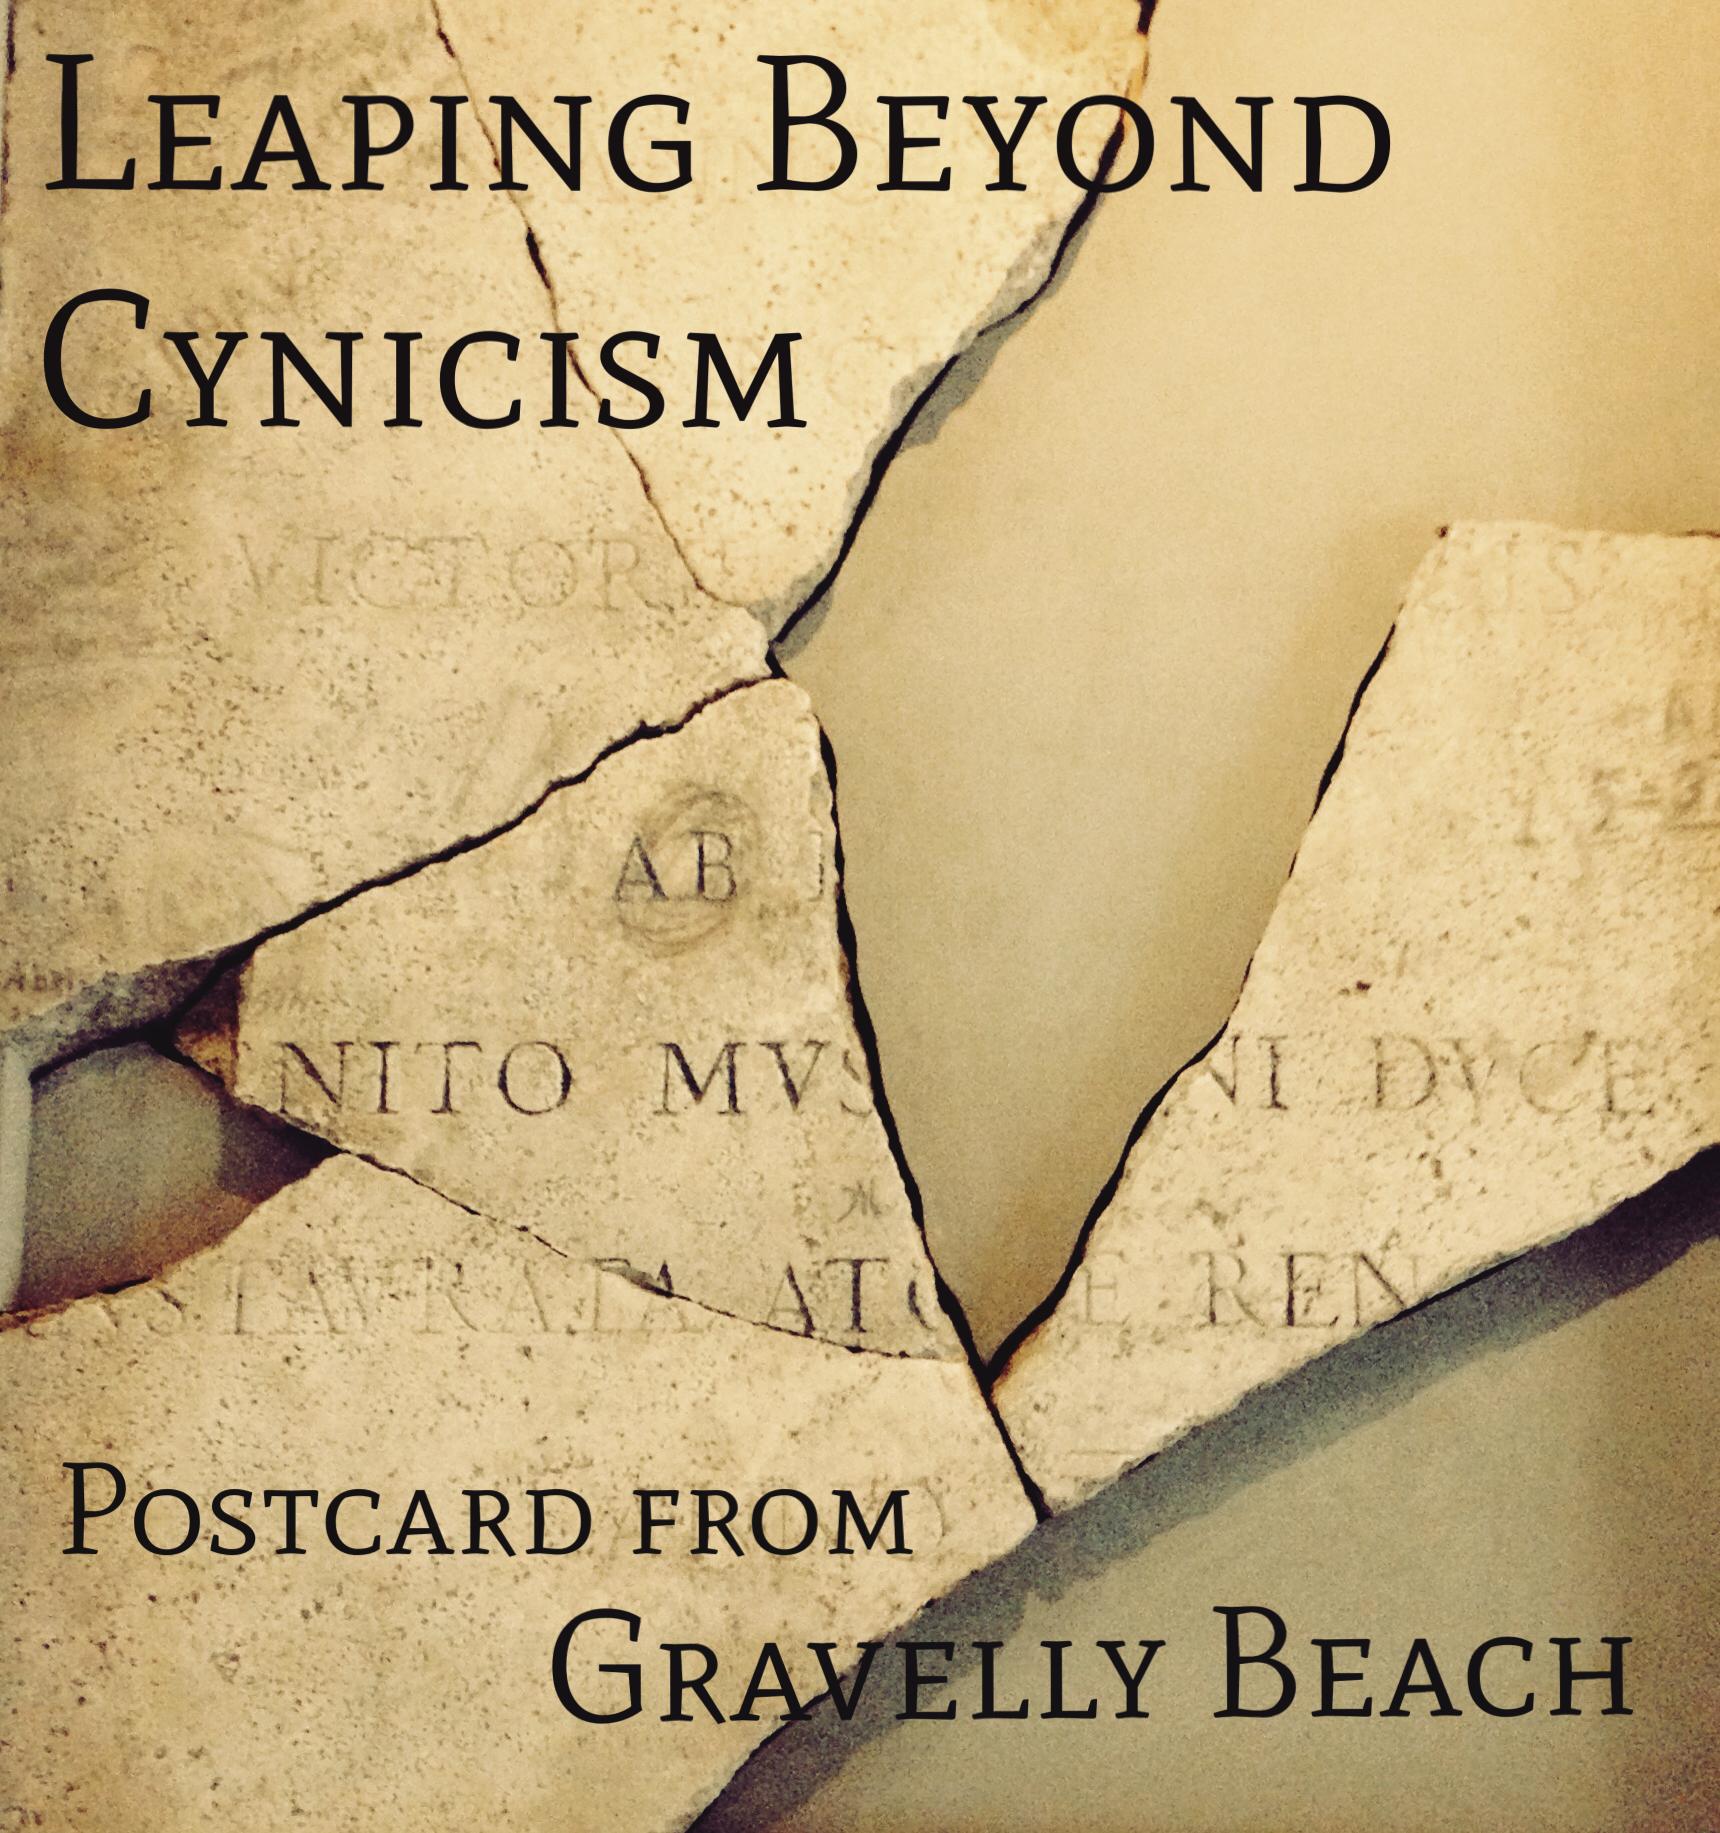 leaping beyong cynicism